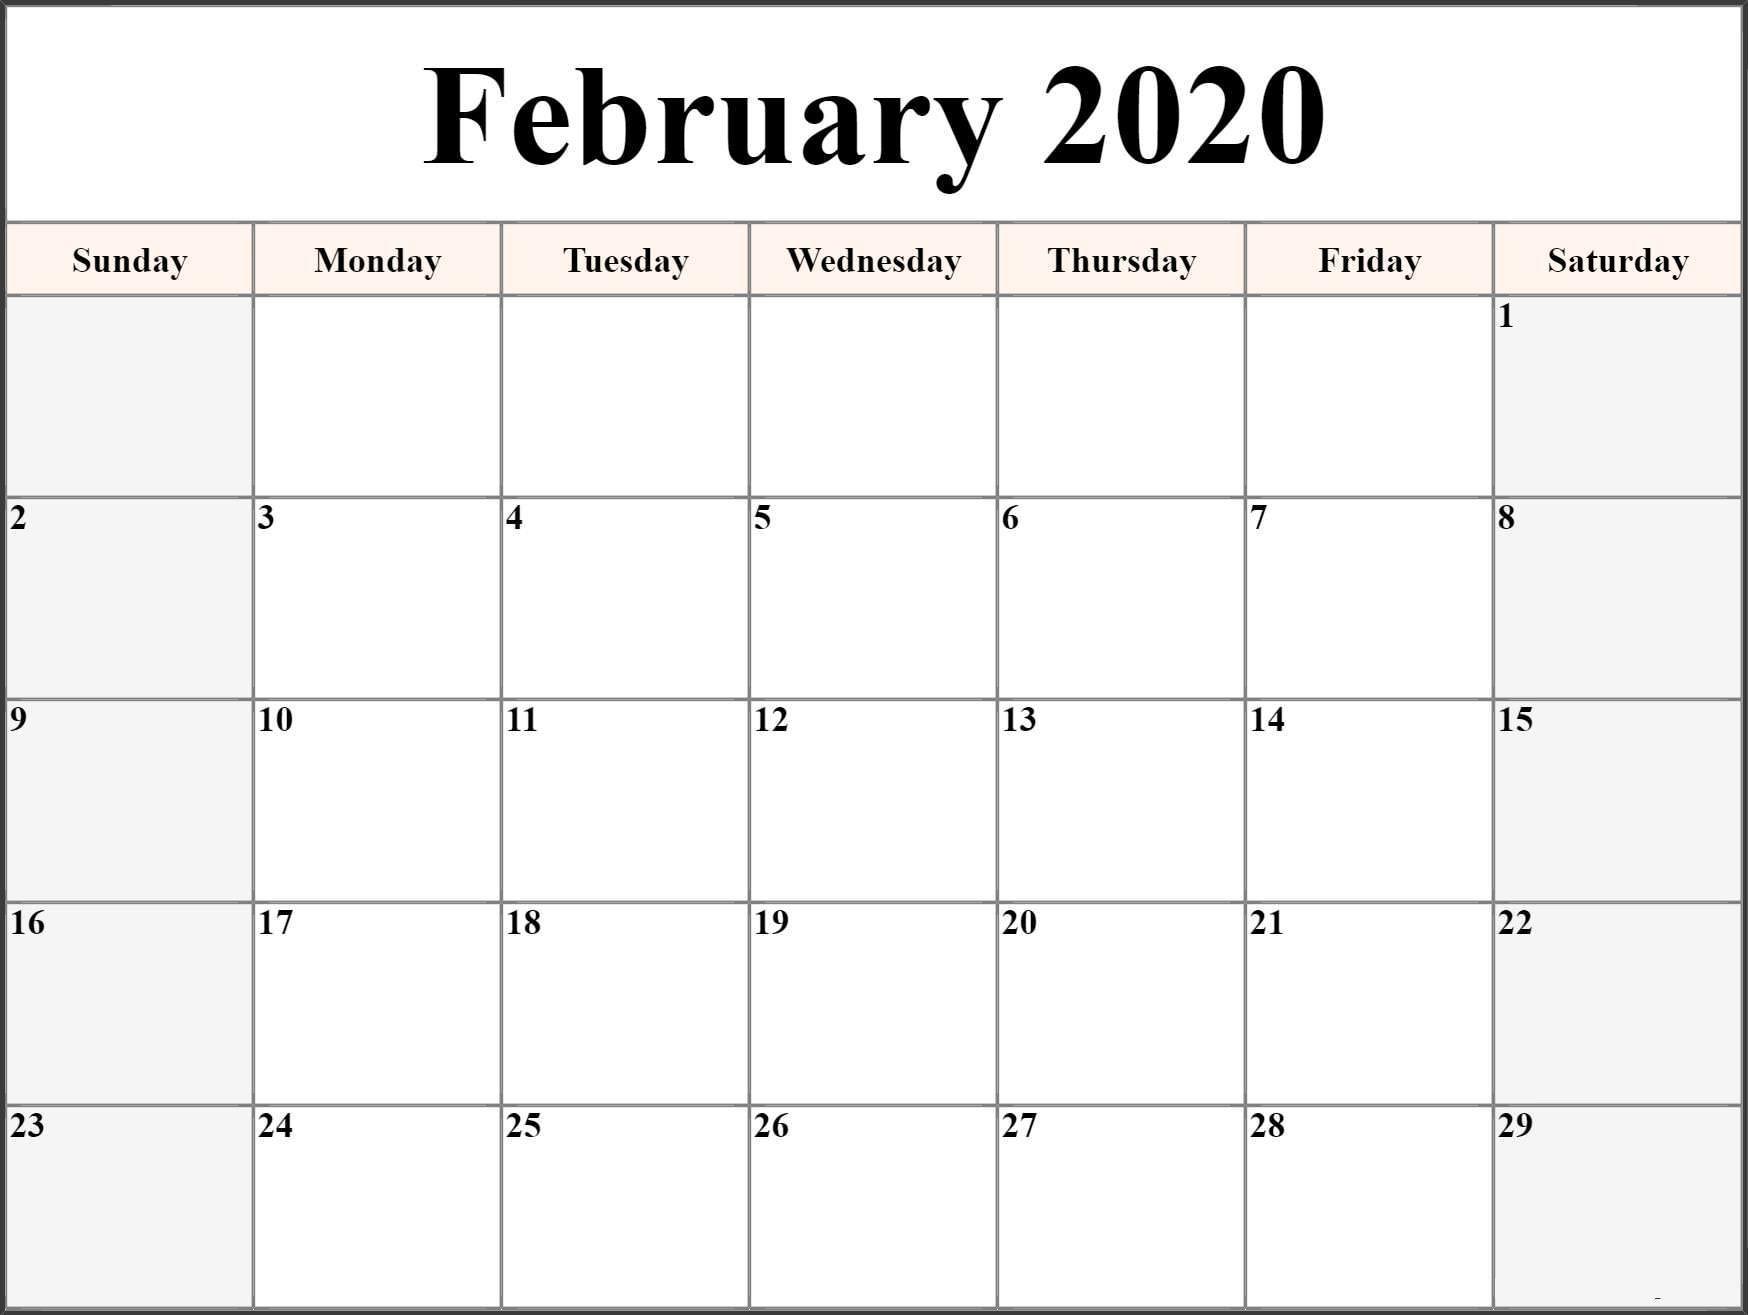 Free Printable February Calendar 2020 Pdf Sheet - Set Your pertaining to Free Printable 2020 Canadian Calendar